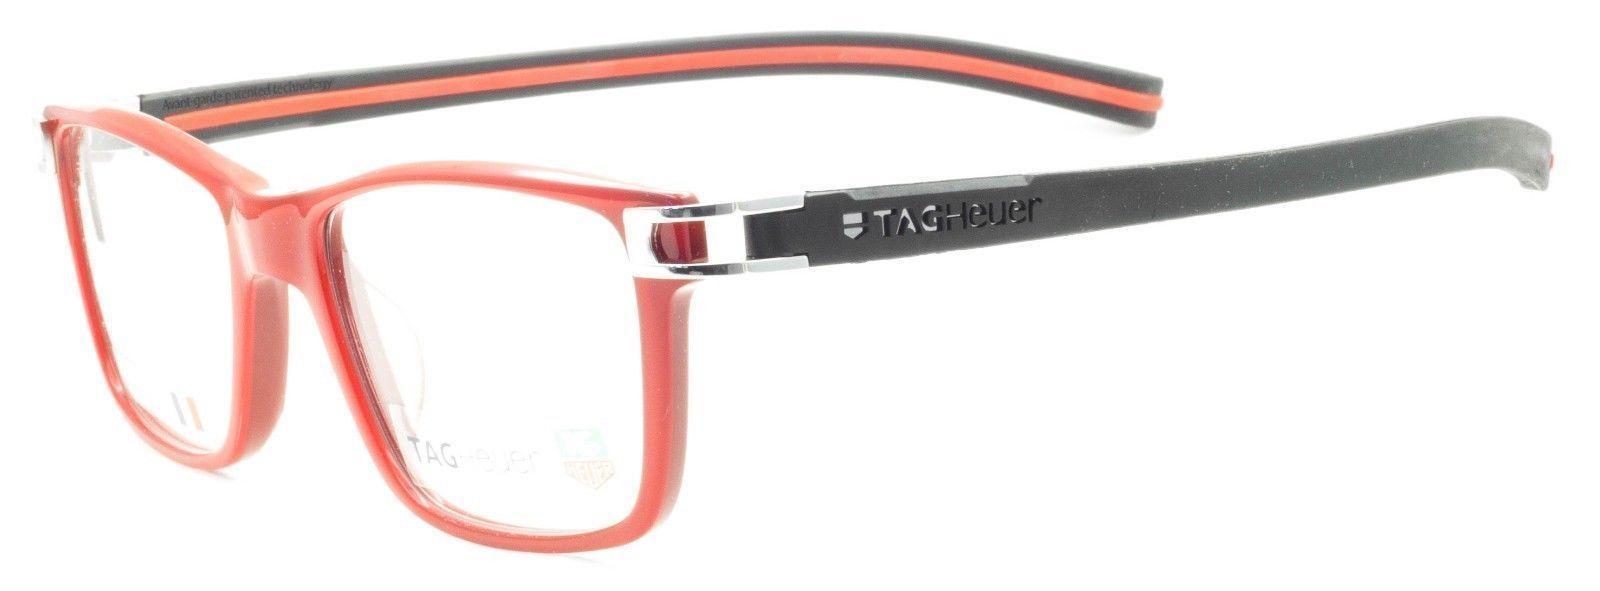 Tag Heuer Eyeglass Frame: 21 listings